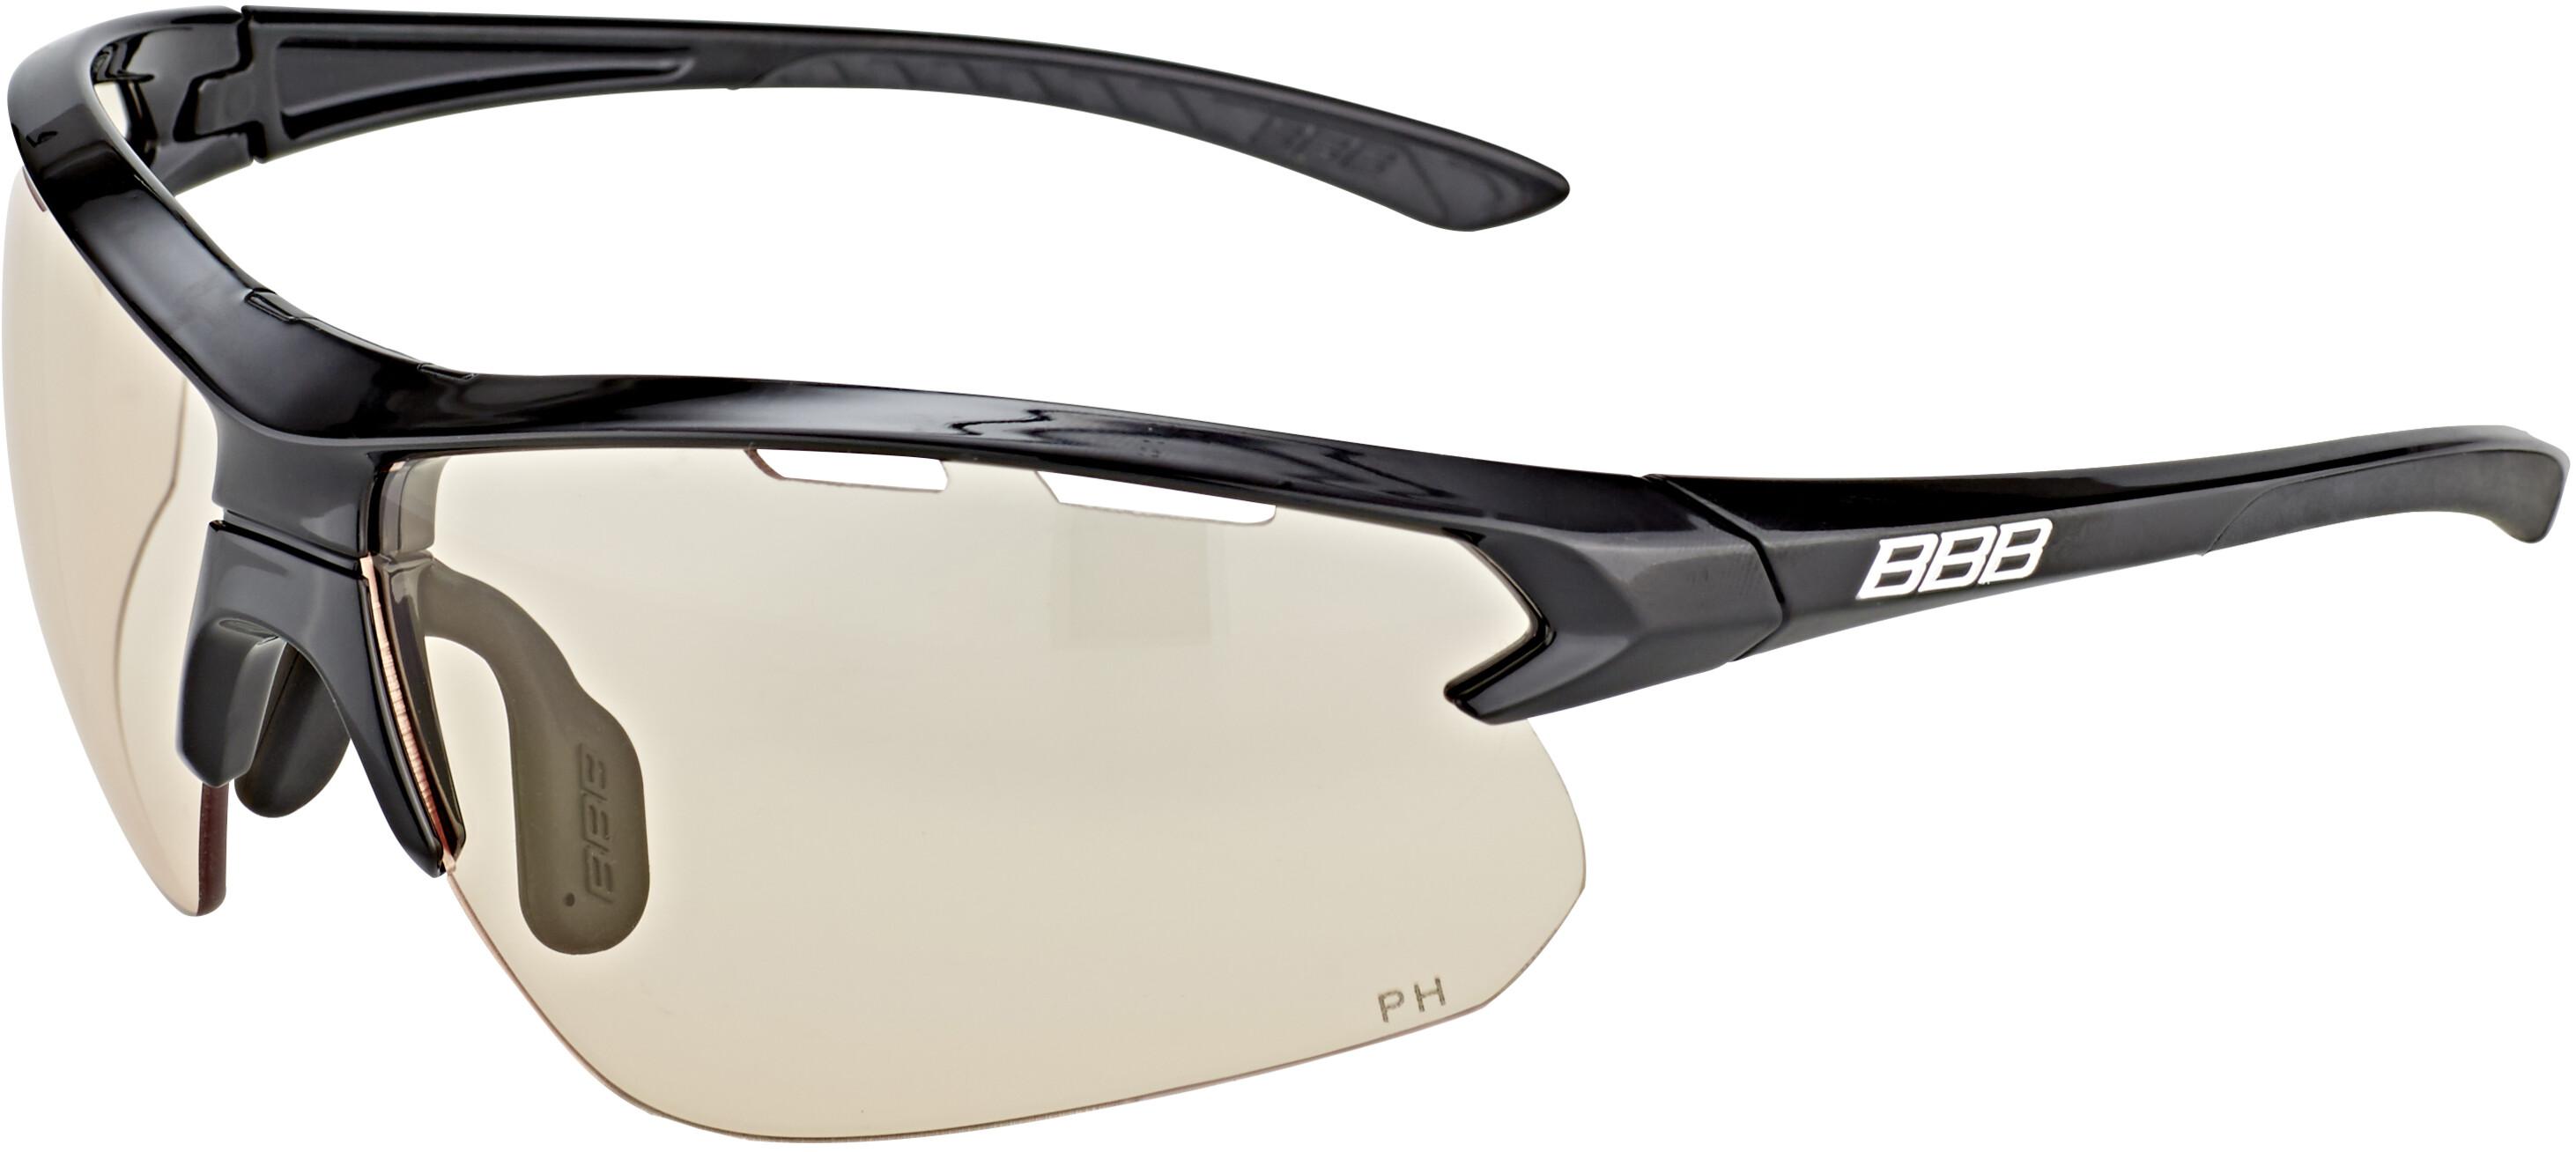 eec970f459f9 BBB Impulse PH BSG-52PH Cykelbriller sort